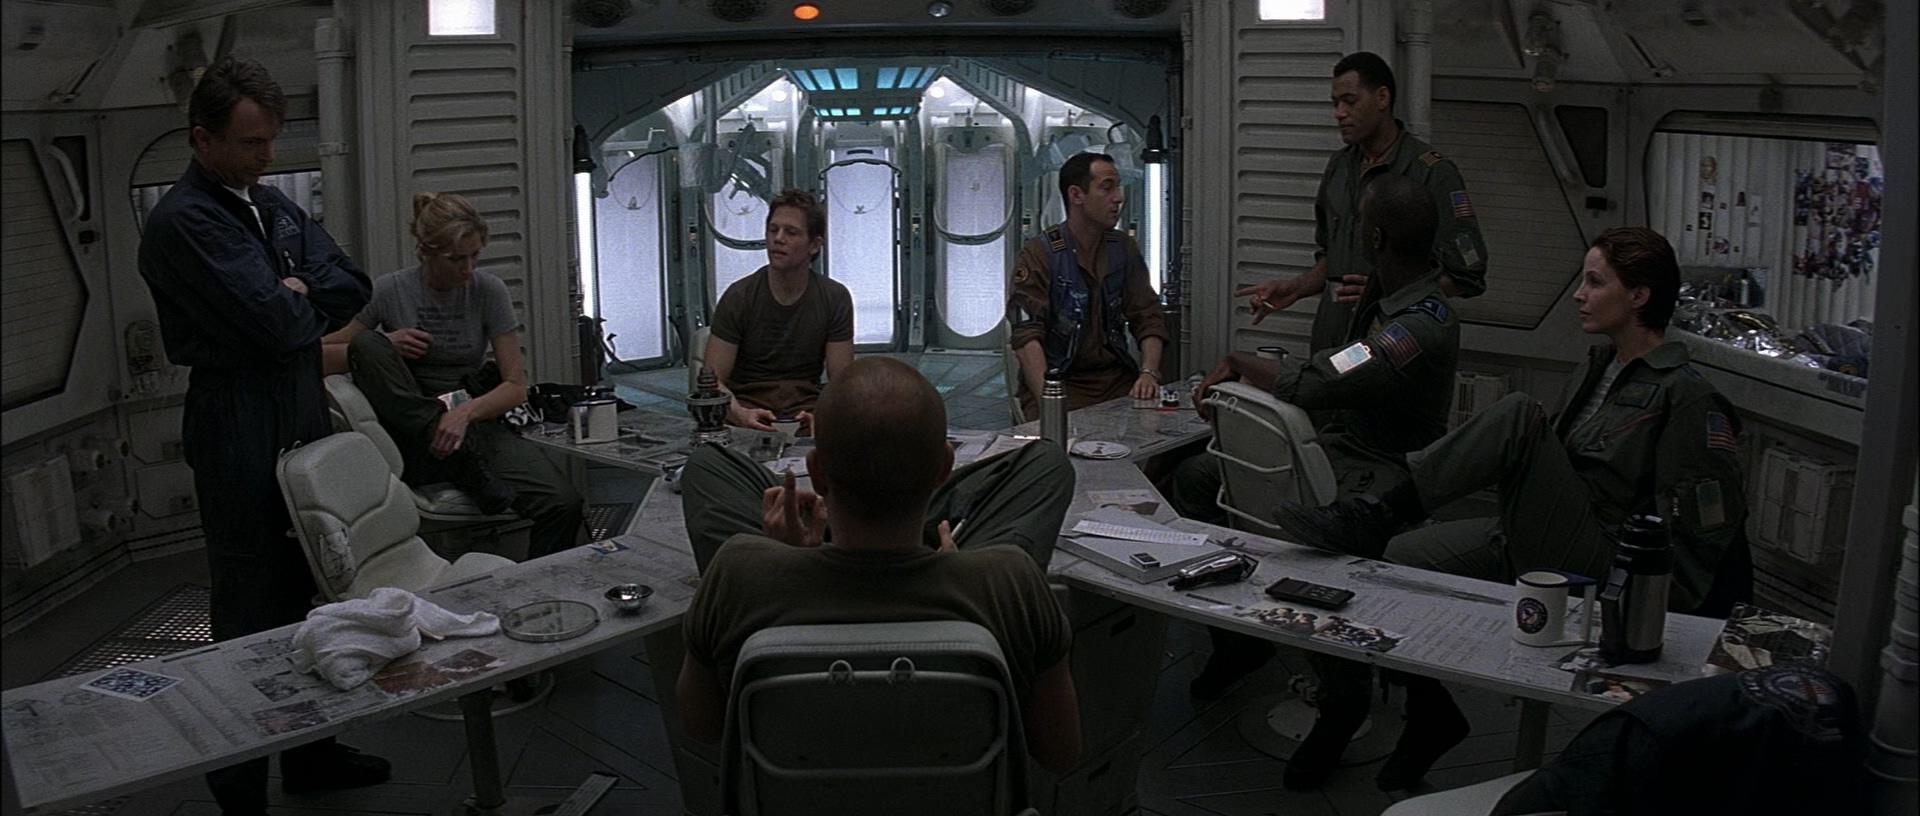 Event Horizon - Punto di Non Ritorno 1997 BDRip 1080p Ita Eng x265-NAHOM.mkv_20161125_131850.883.jpg